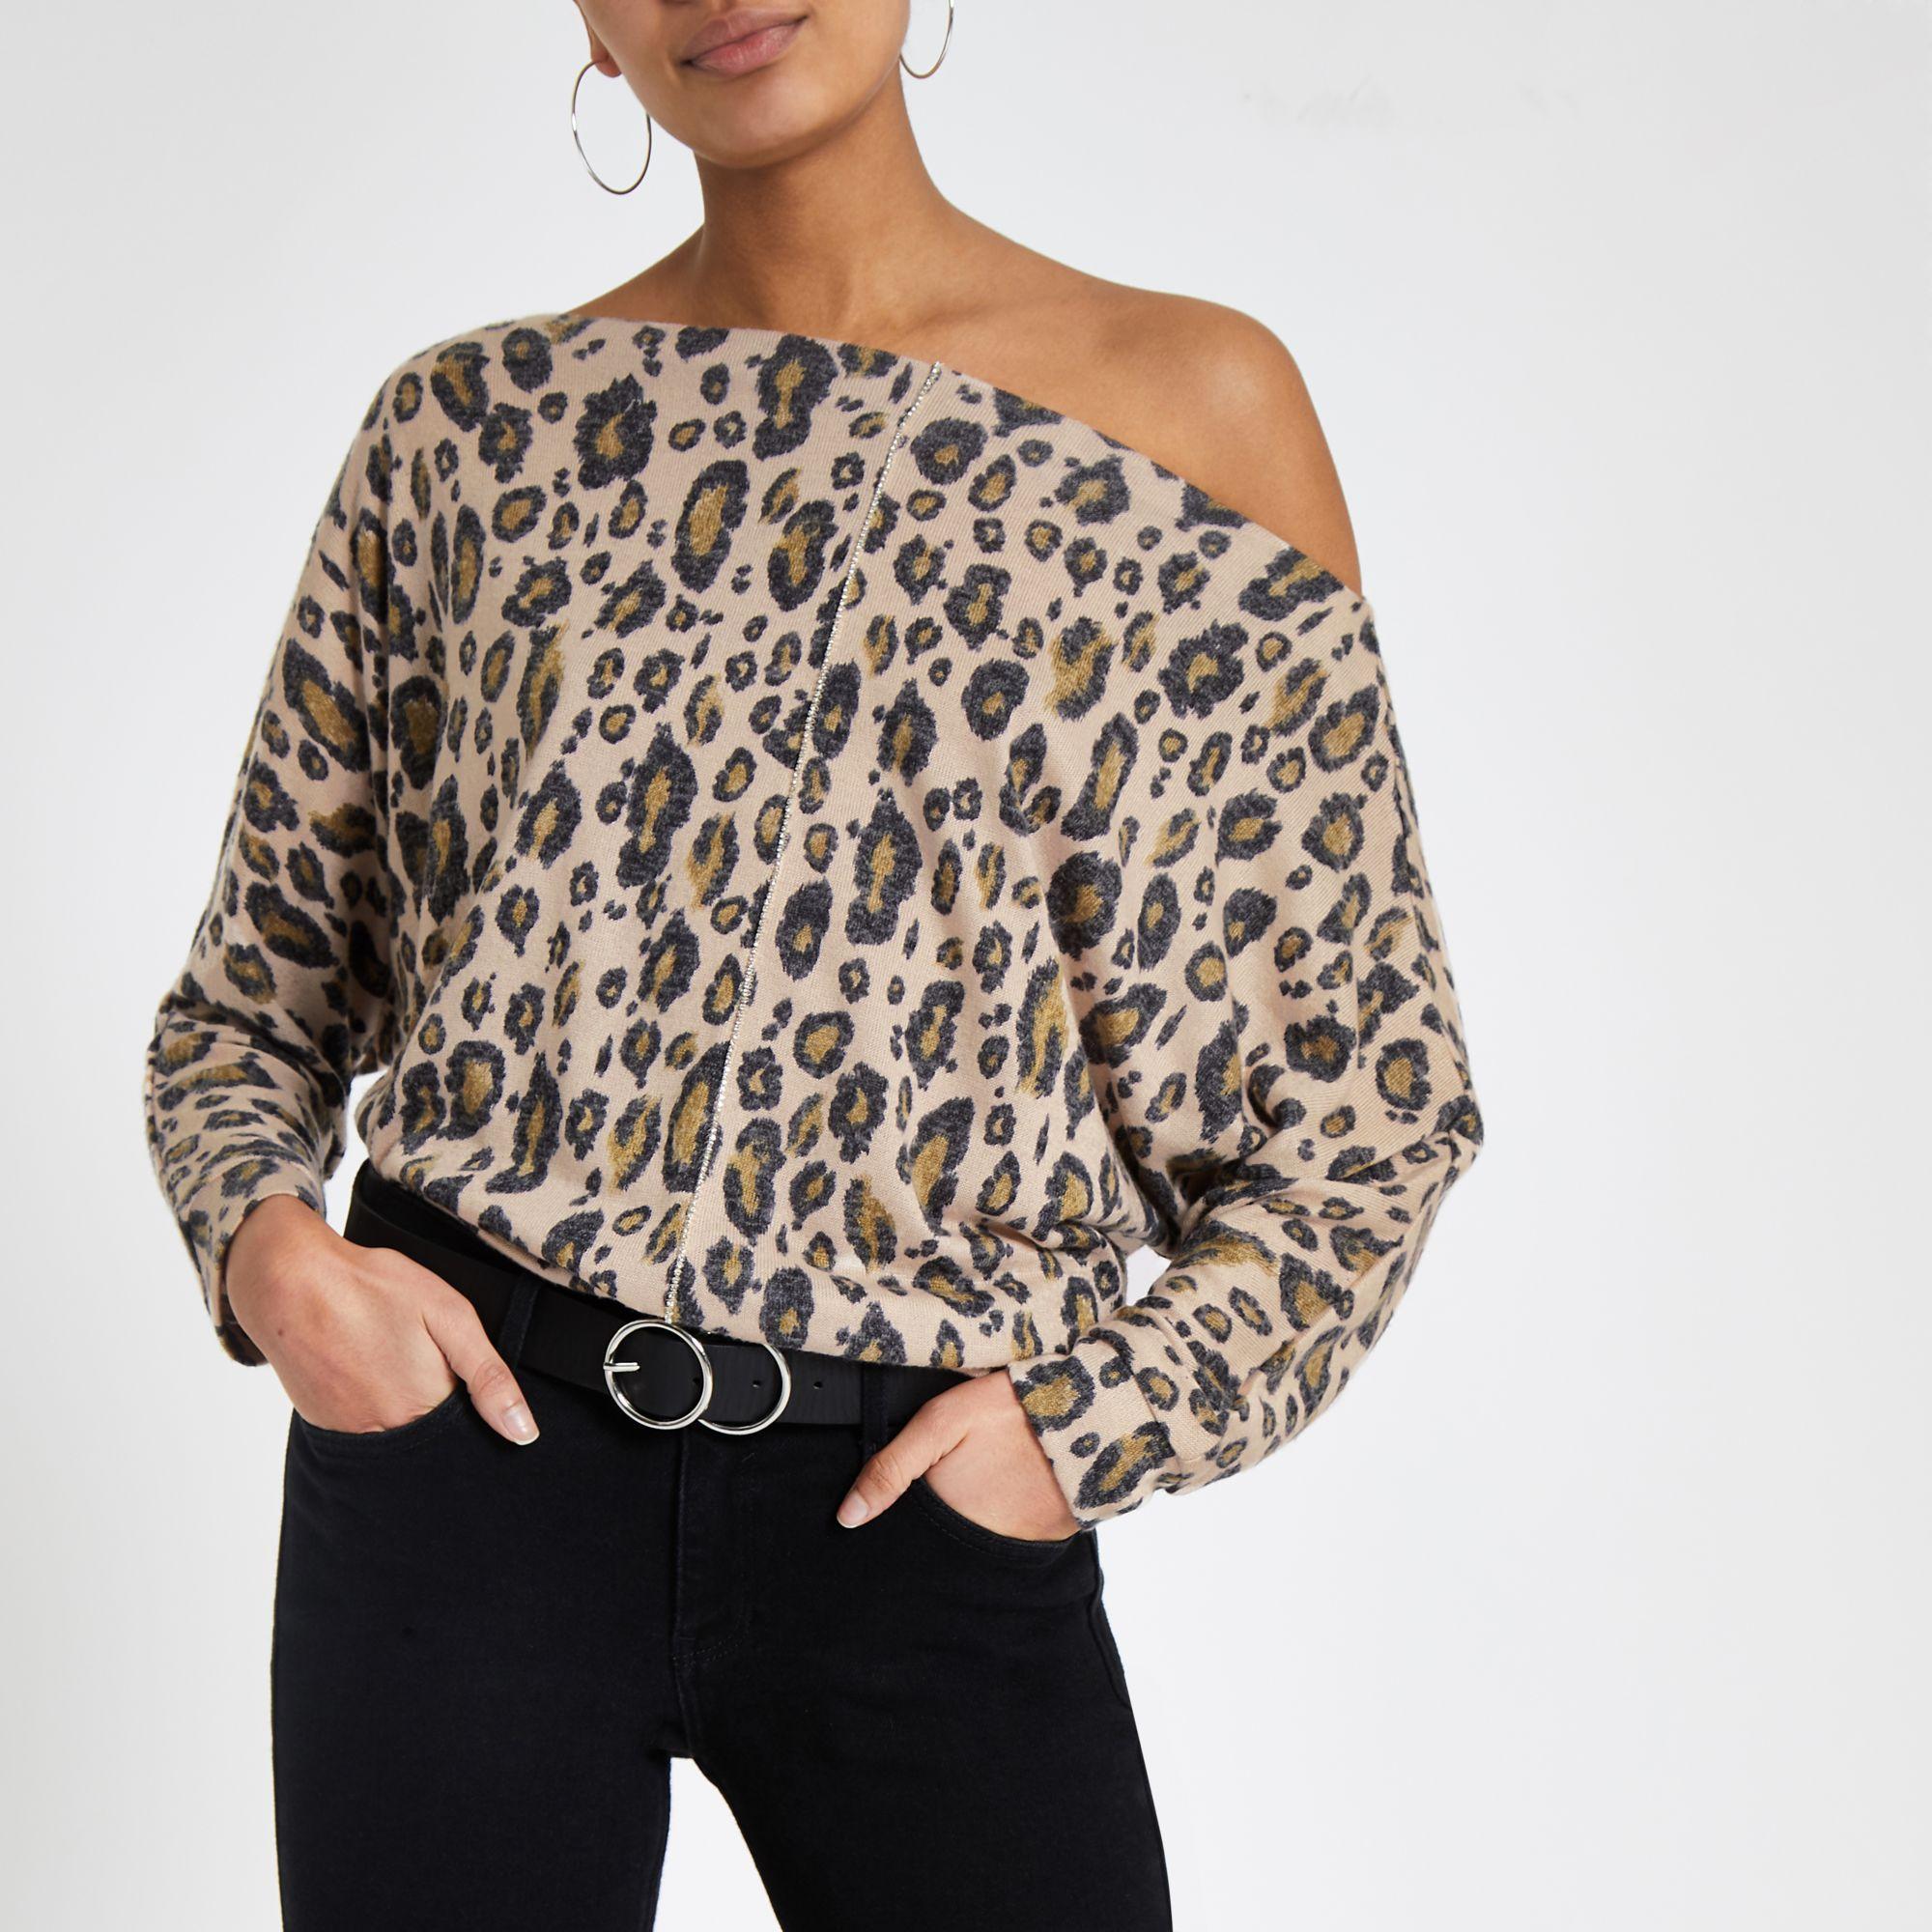 5938b689b14078 River Island Leopard Print Batwing Sleeve Top in Brown - Lyst